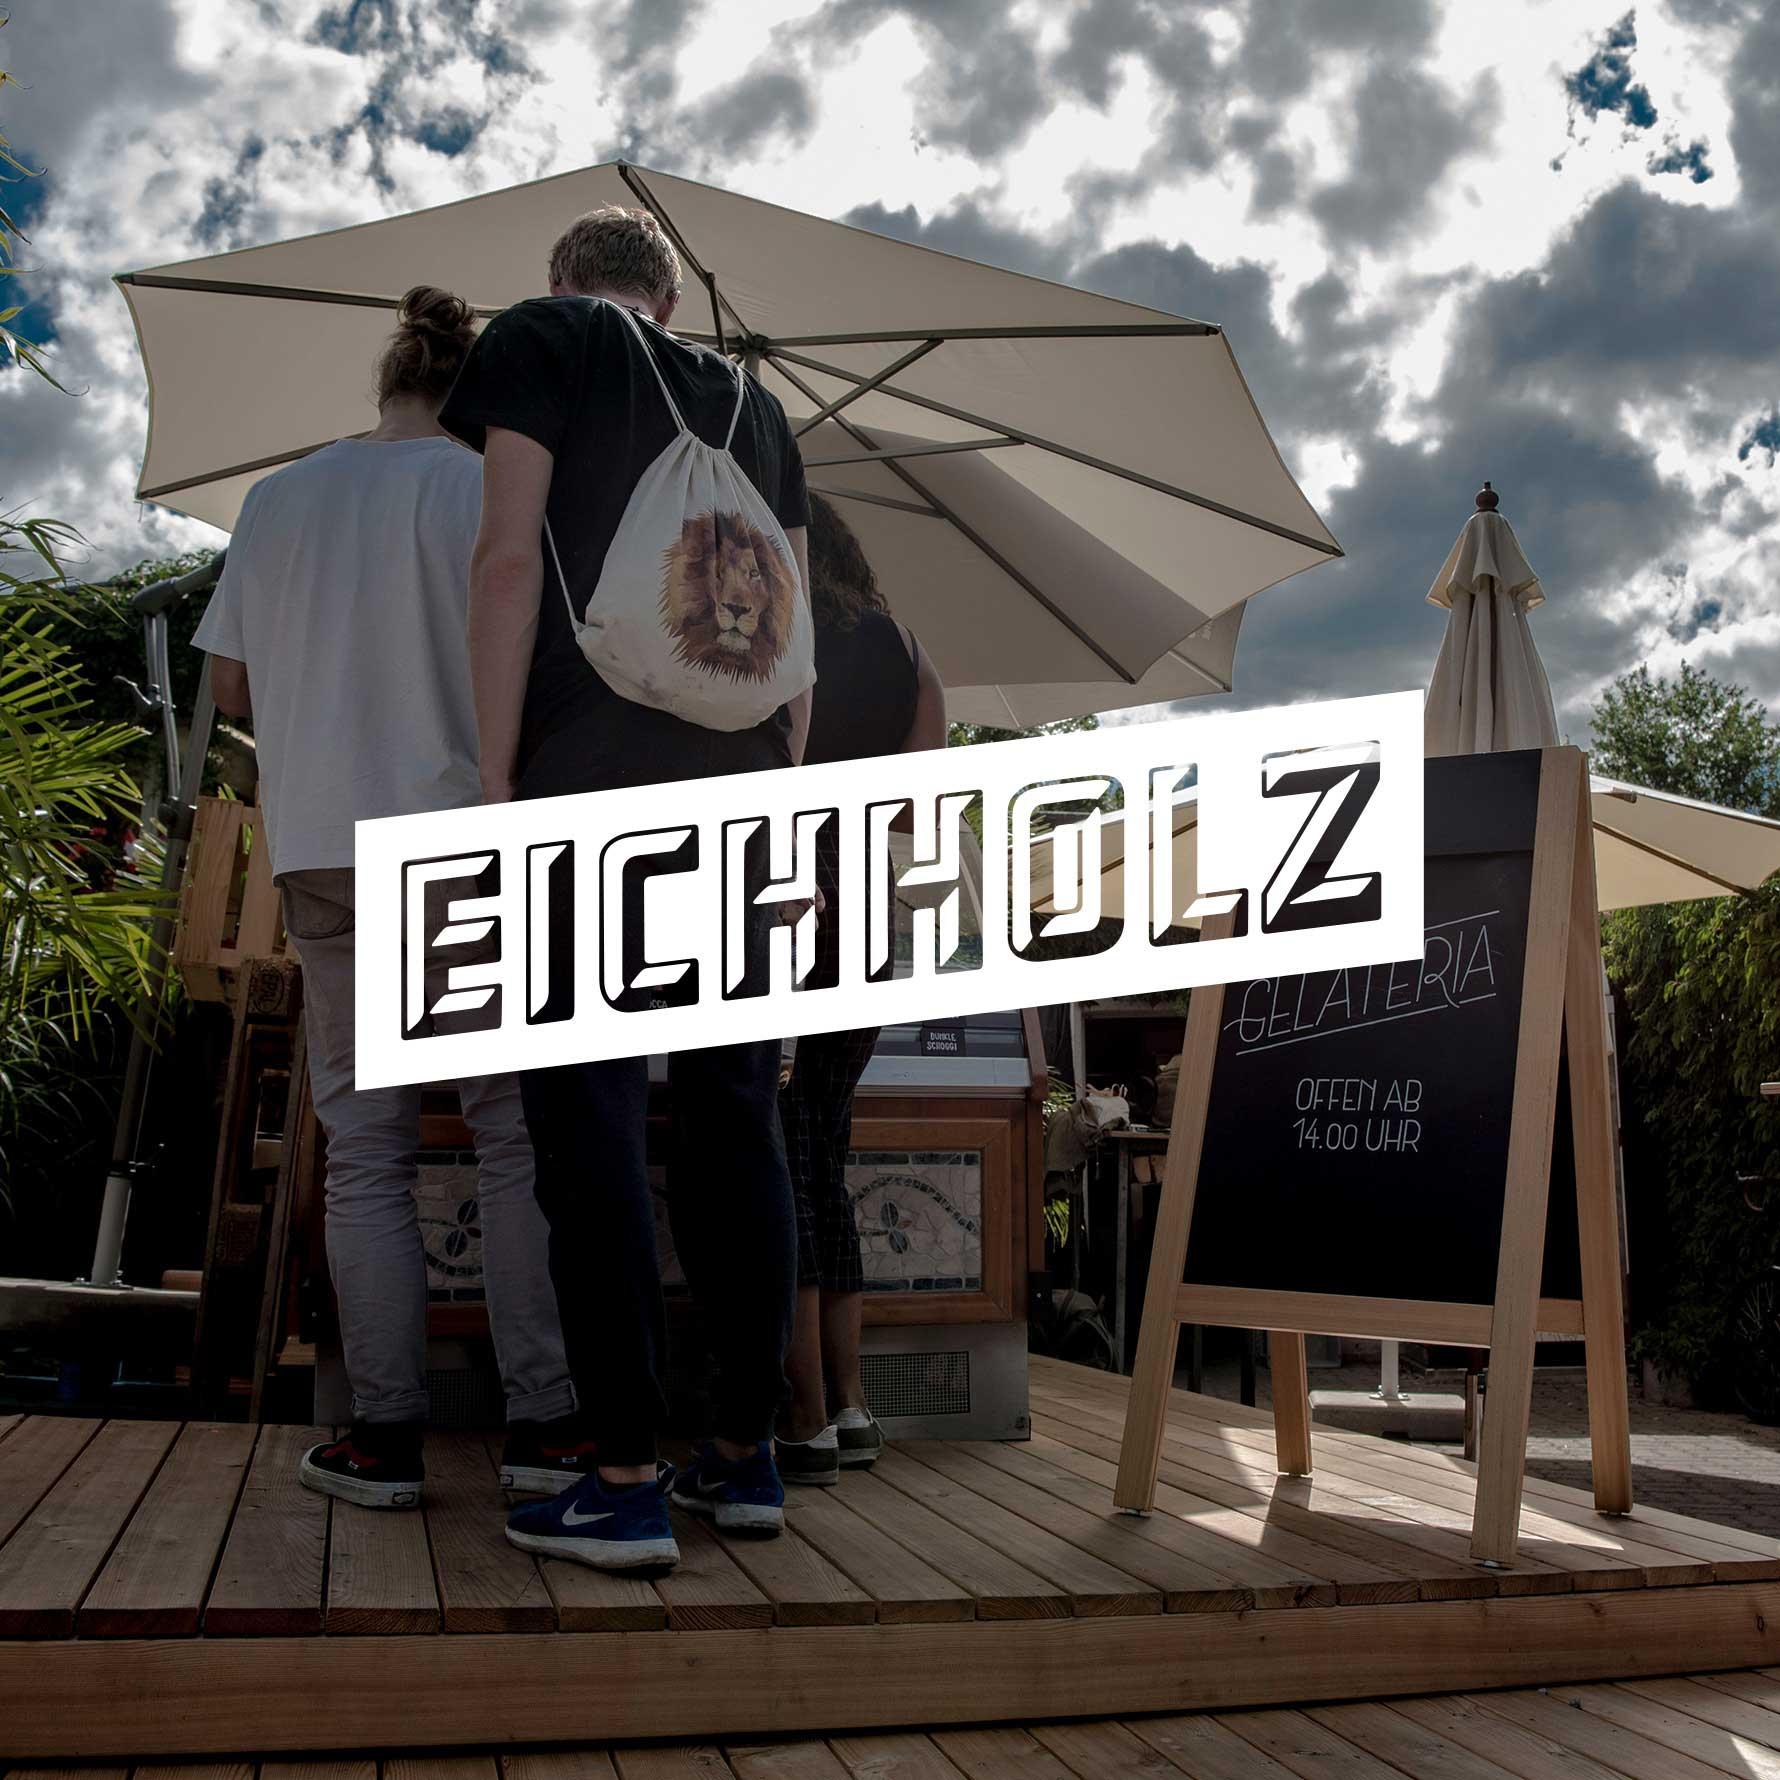 Willkommen Restaurant Serini Eichholz